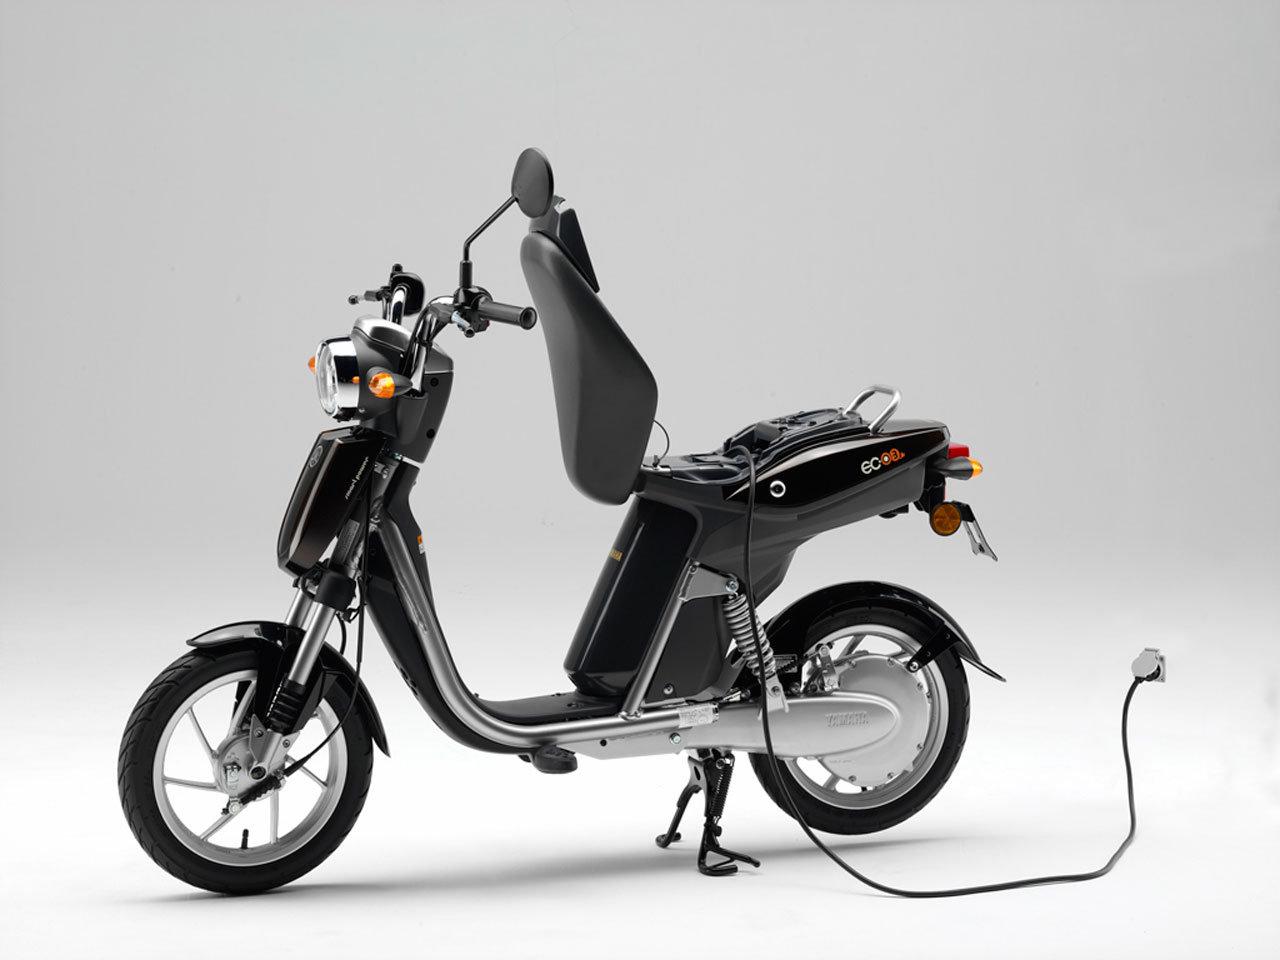 Listino Moto-Guzzi Bellagio 940 Custom e Cruiser - image 15566_yamaha-ec03 on https://moto.motori.net